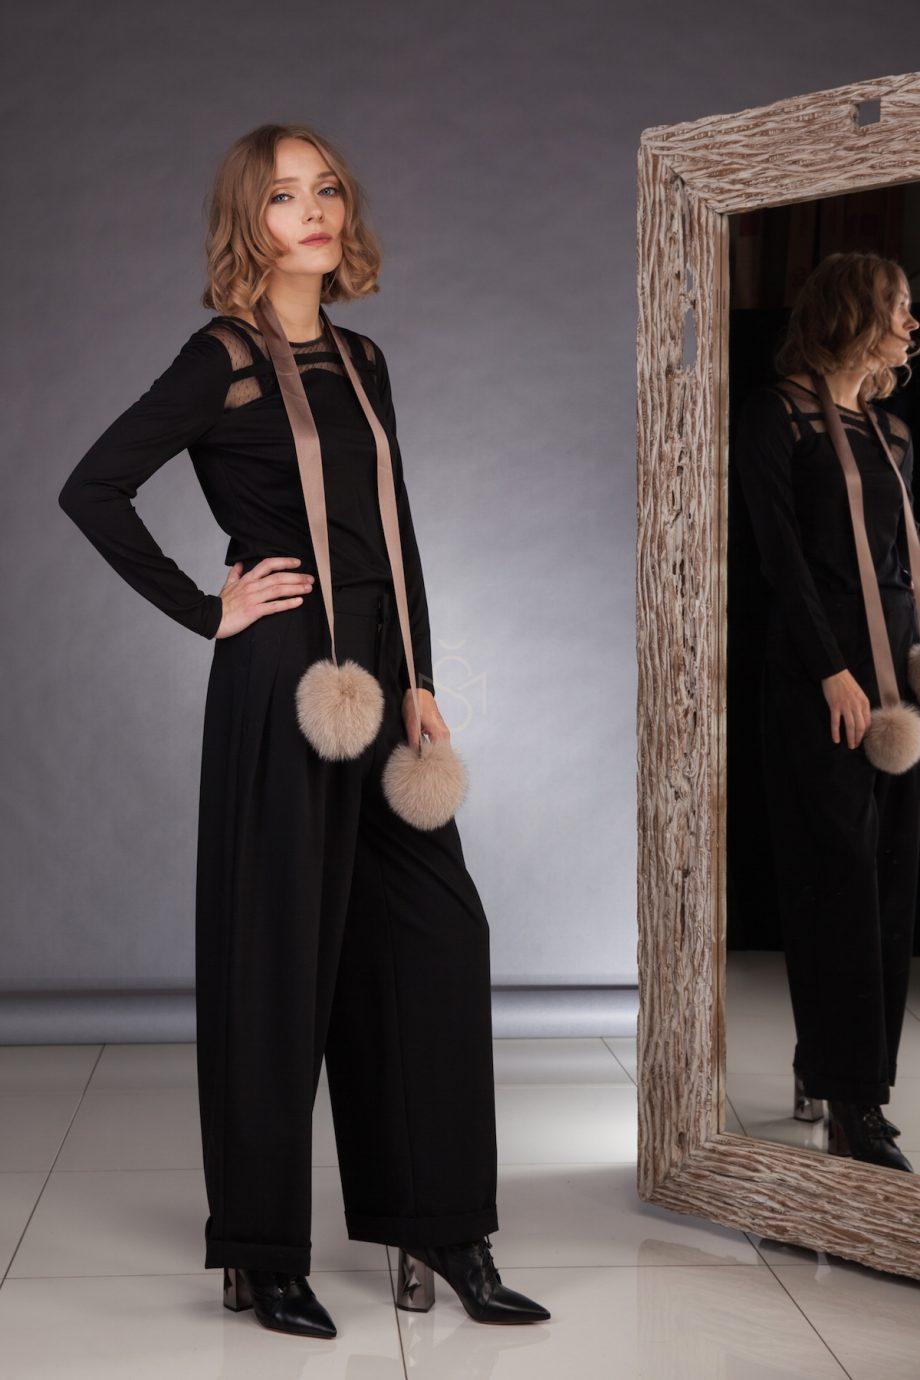 Ribbon with fox fur pom-poms_brown_made by SILTA MADA fur studio in Vilnius